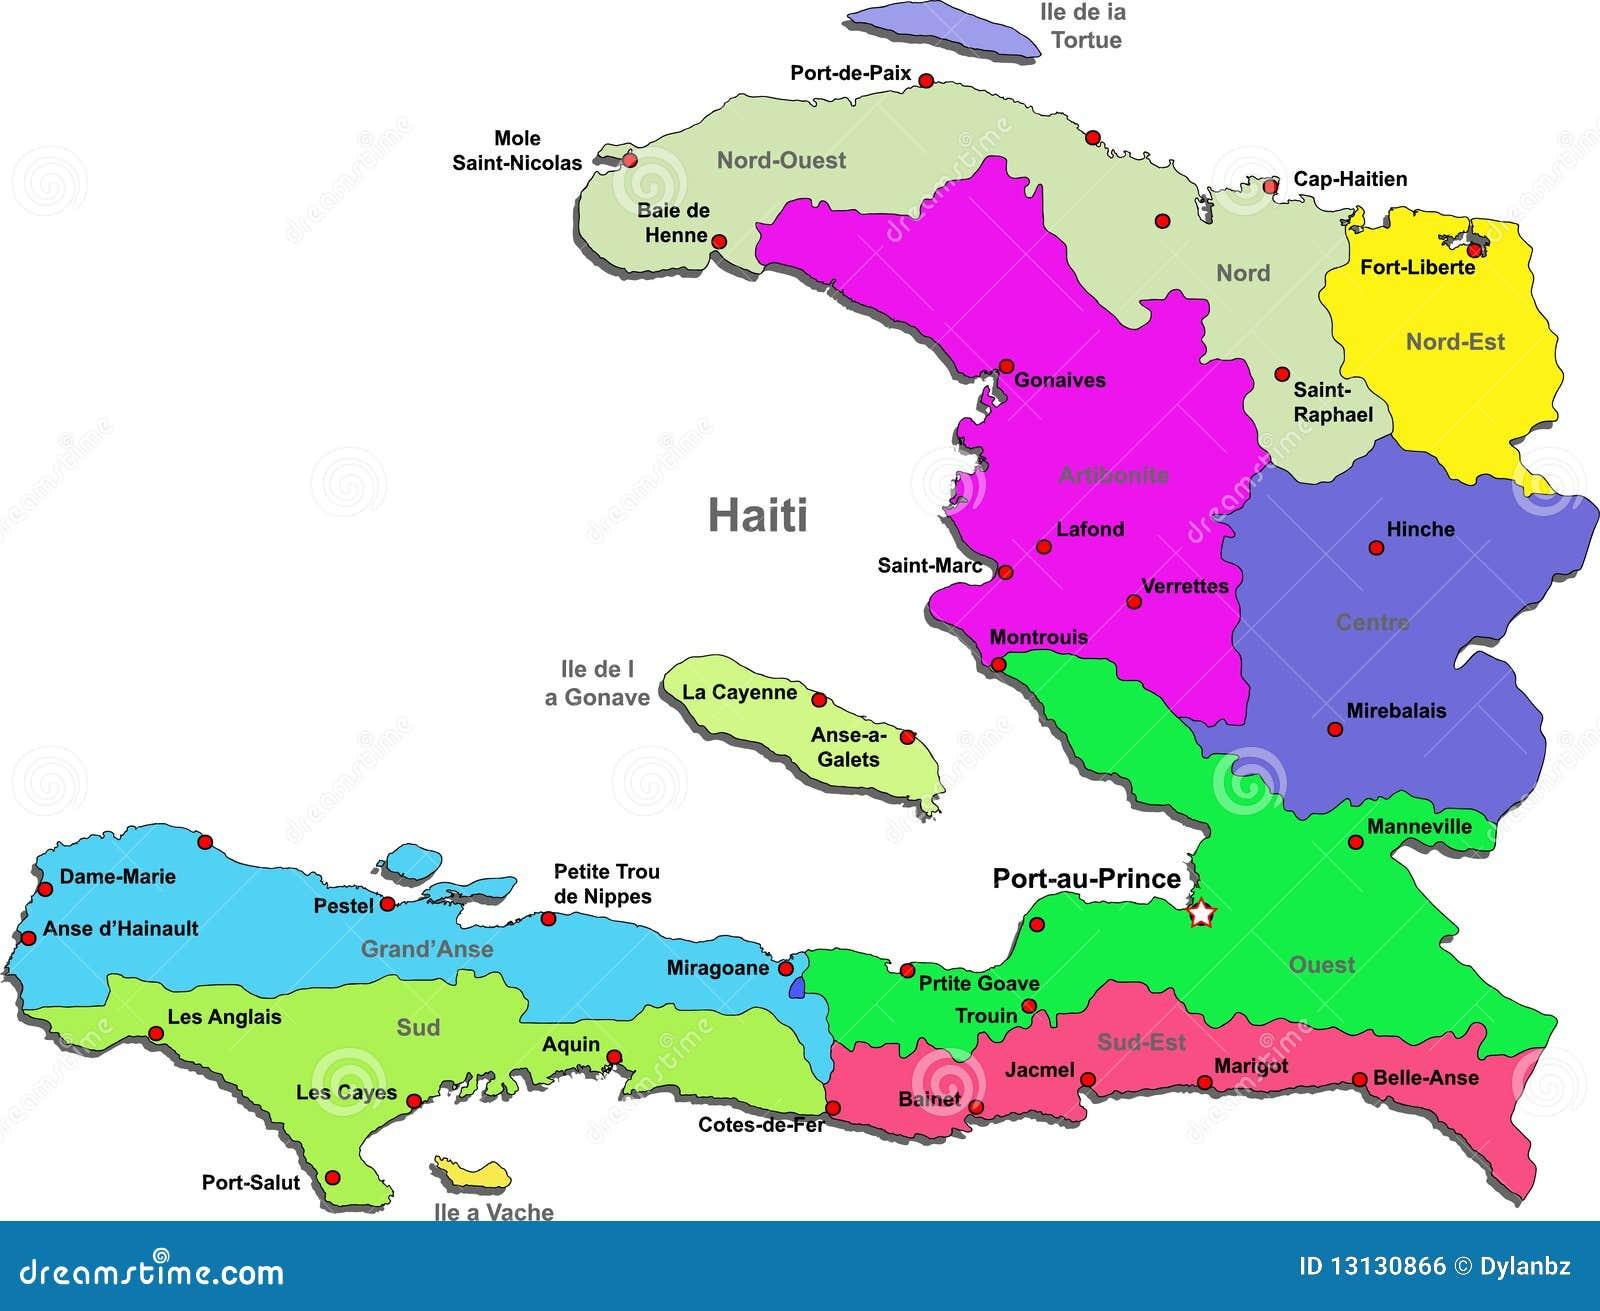 Haiti Map Royalty Free Stock Image Image - Haiti regions map